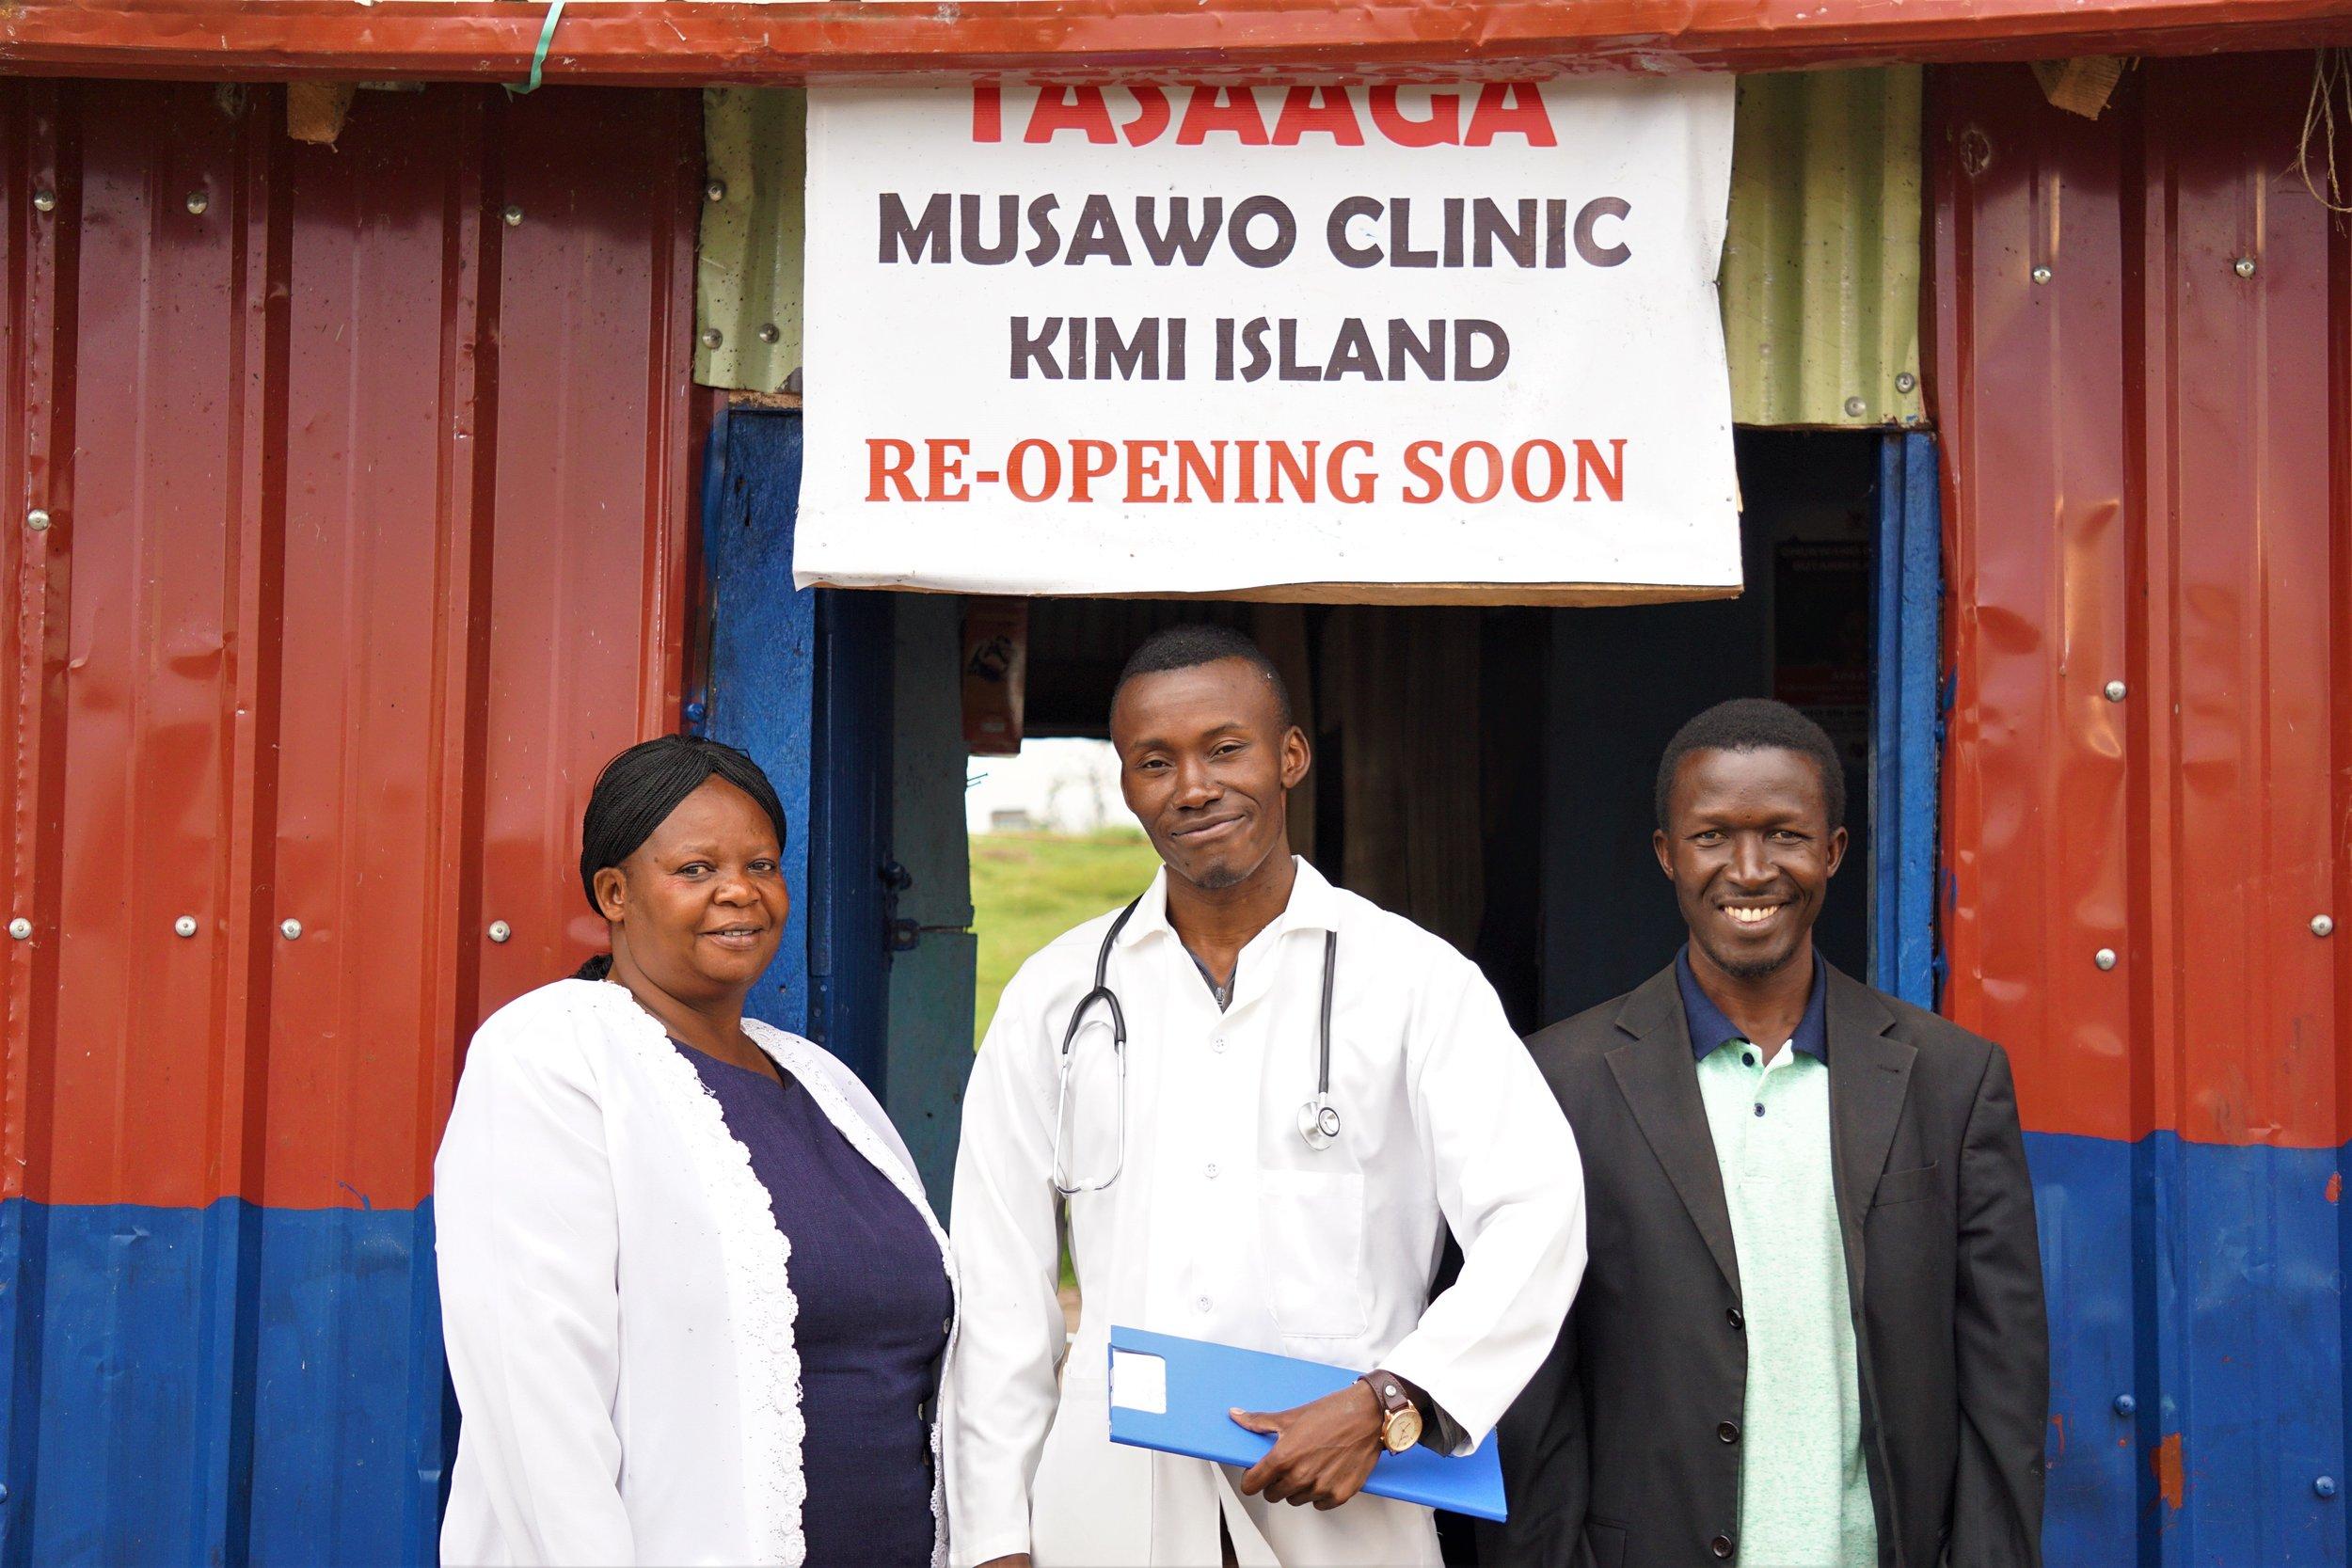 Musawo Clinic - Kimi Island